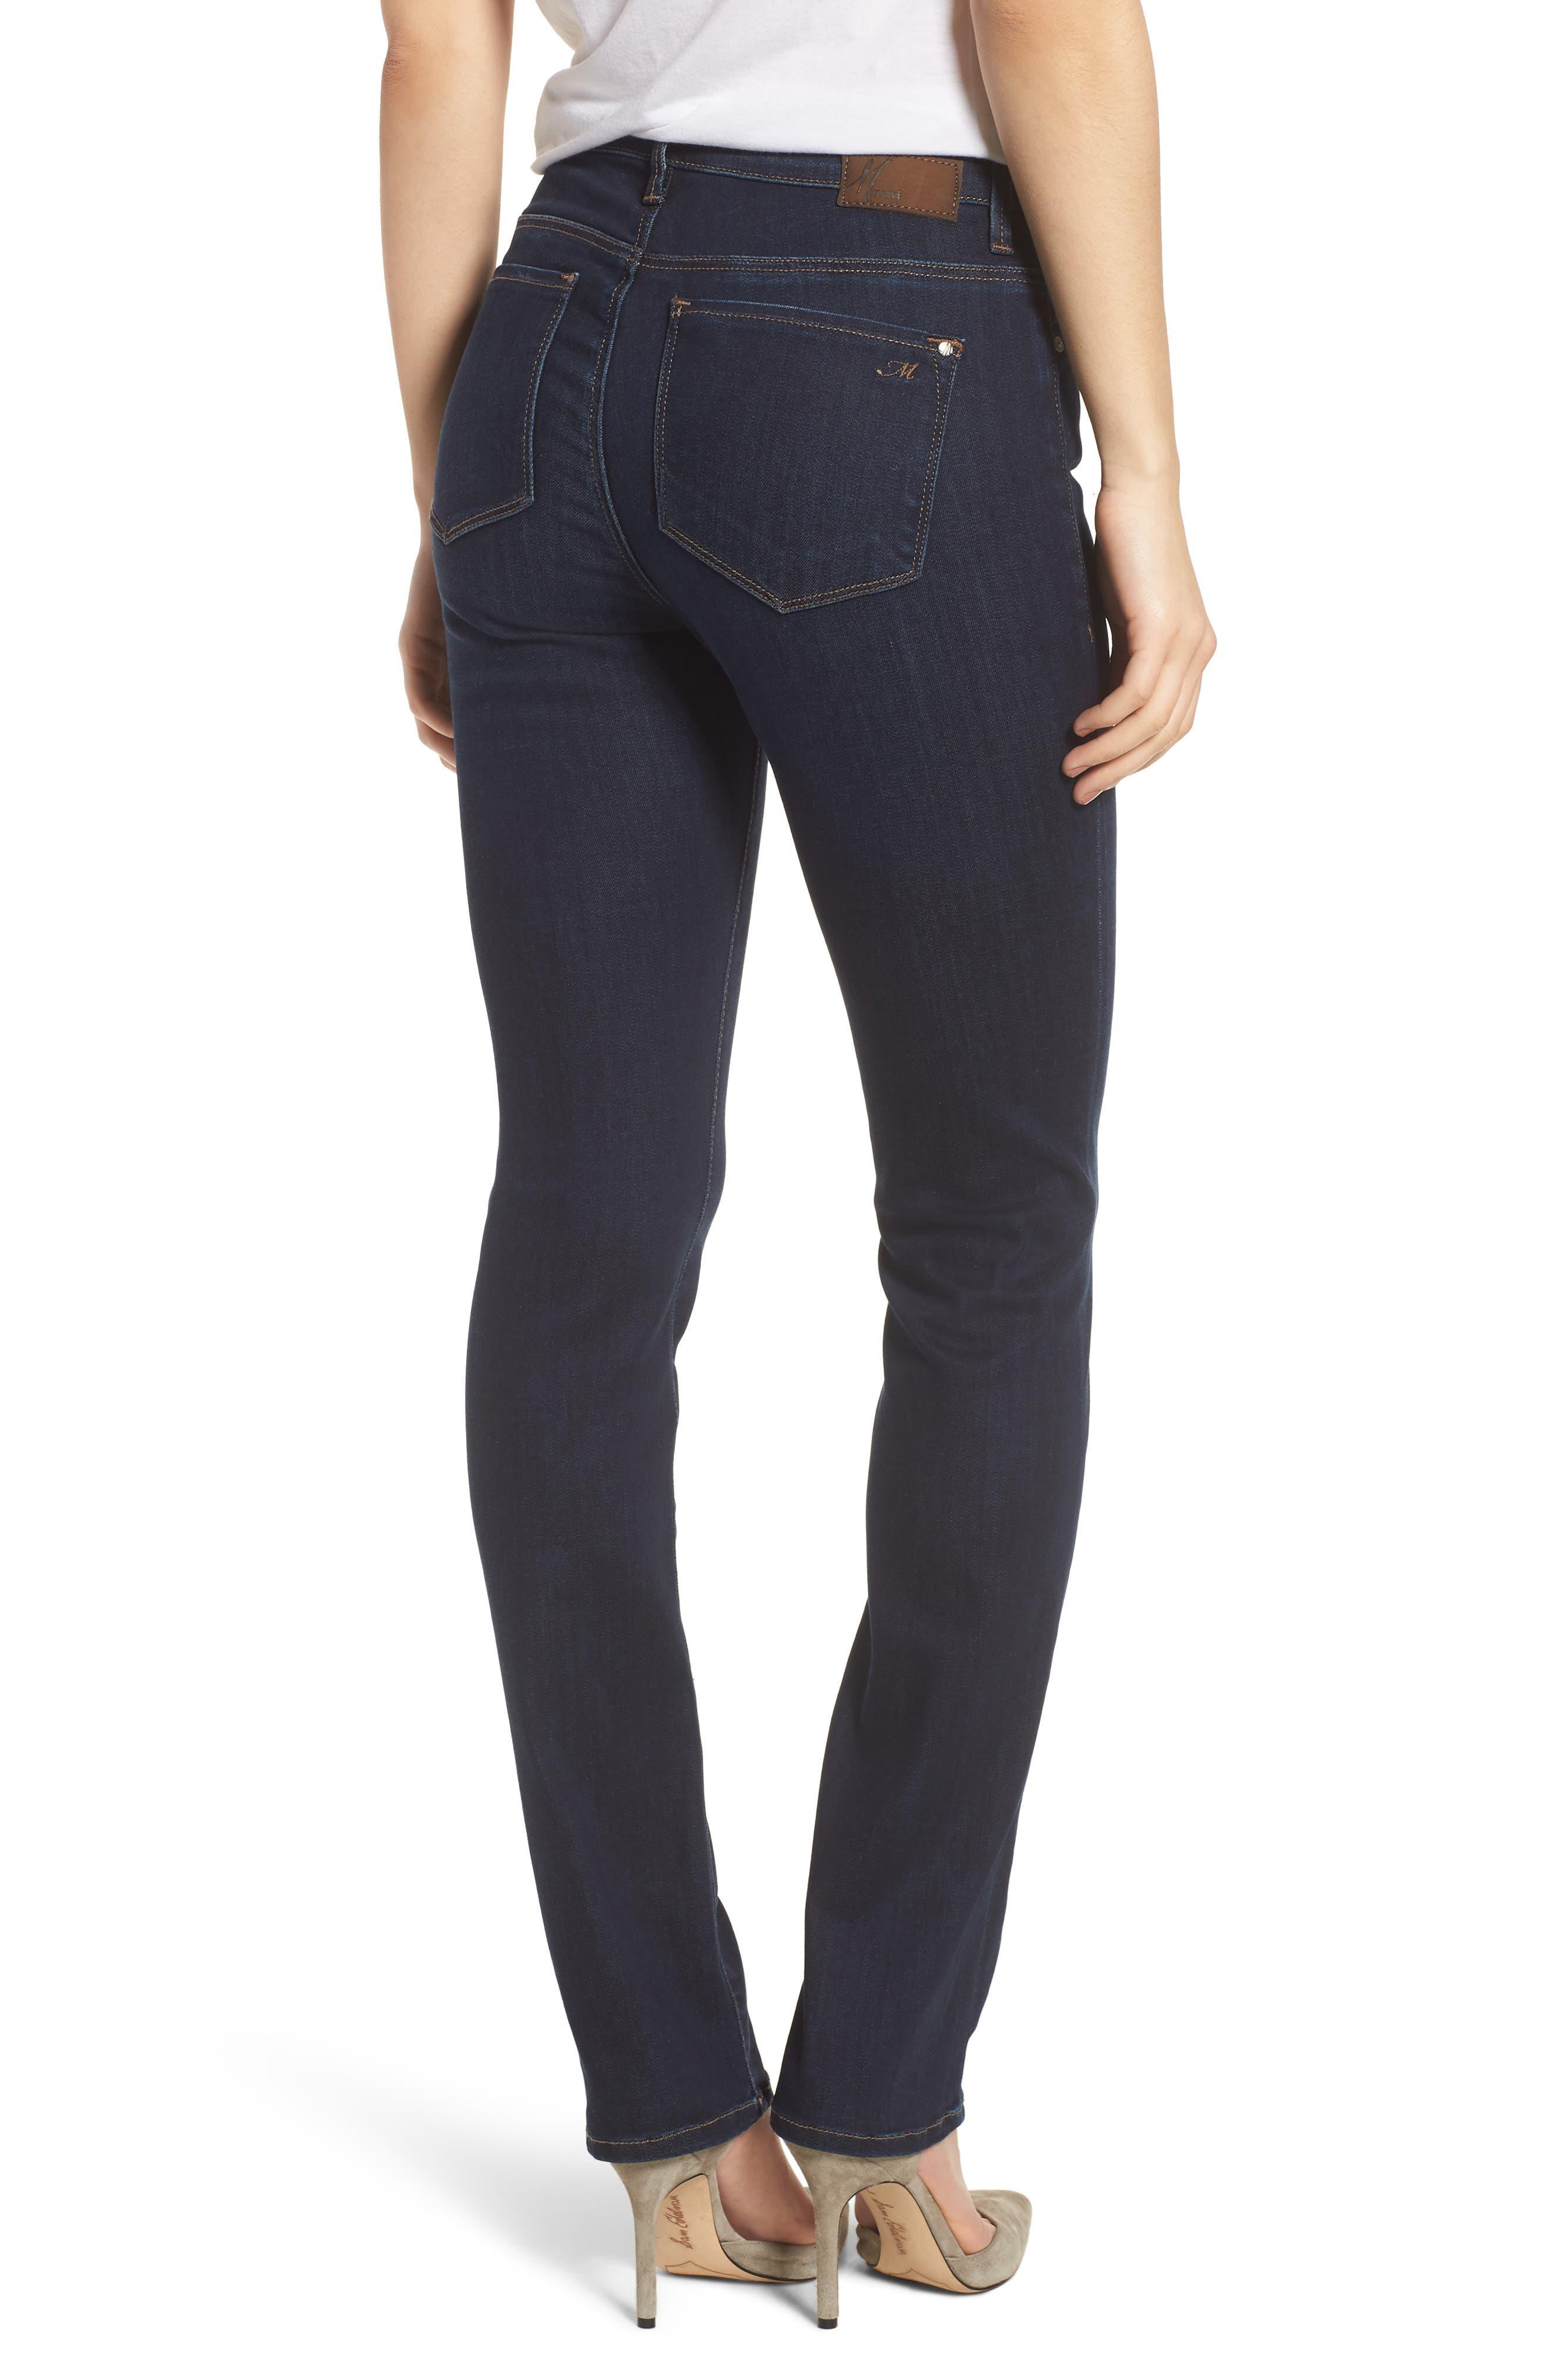 Kendra Straight Leg Jeans,                             Alternate thumbnail 2, color,                             DEEP SUPERSOFT